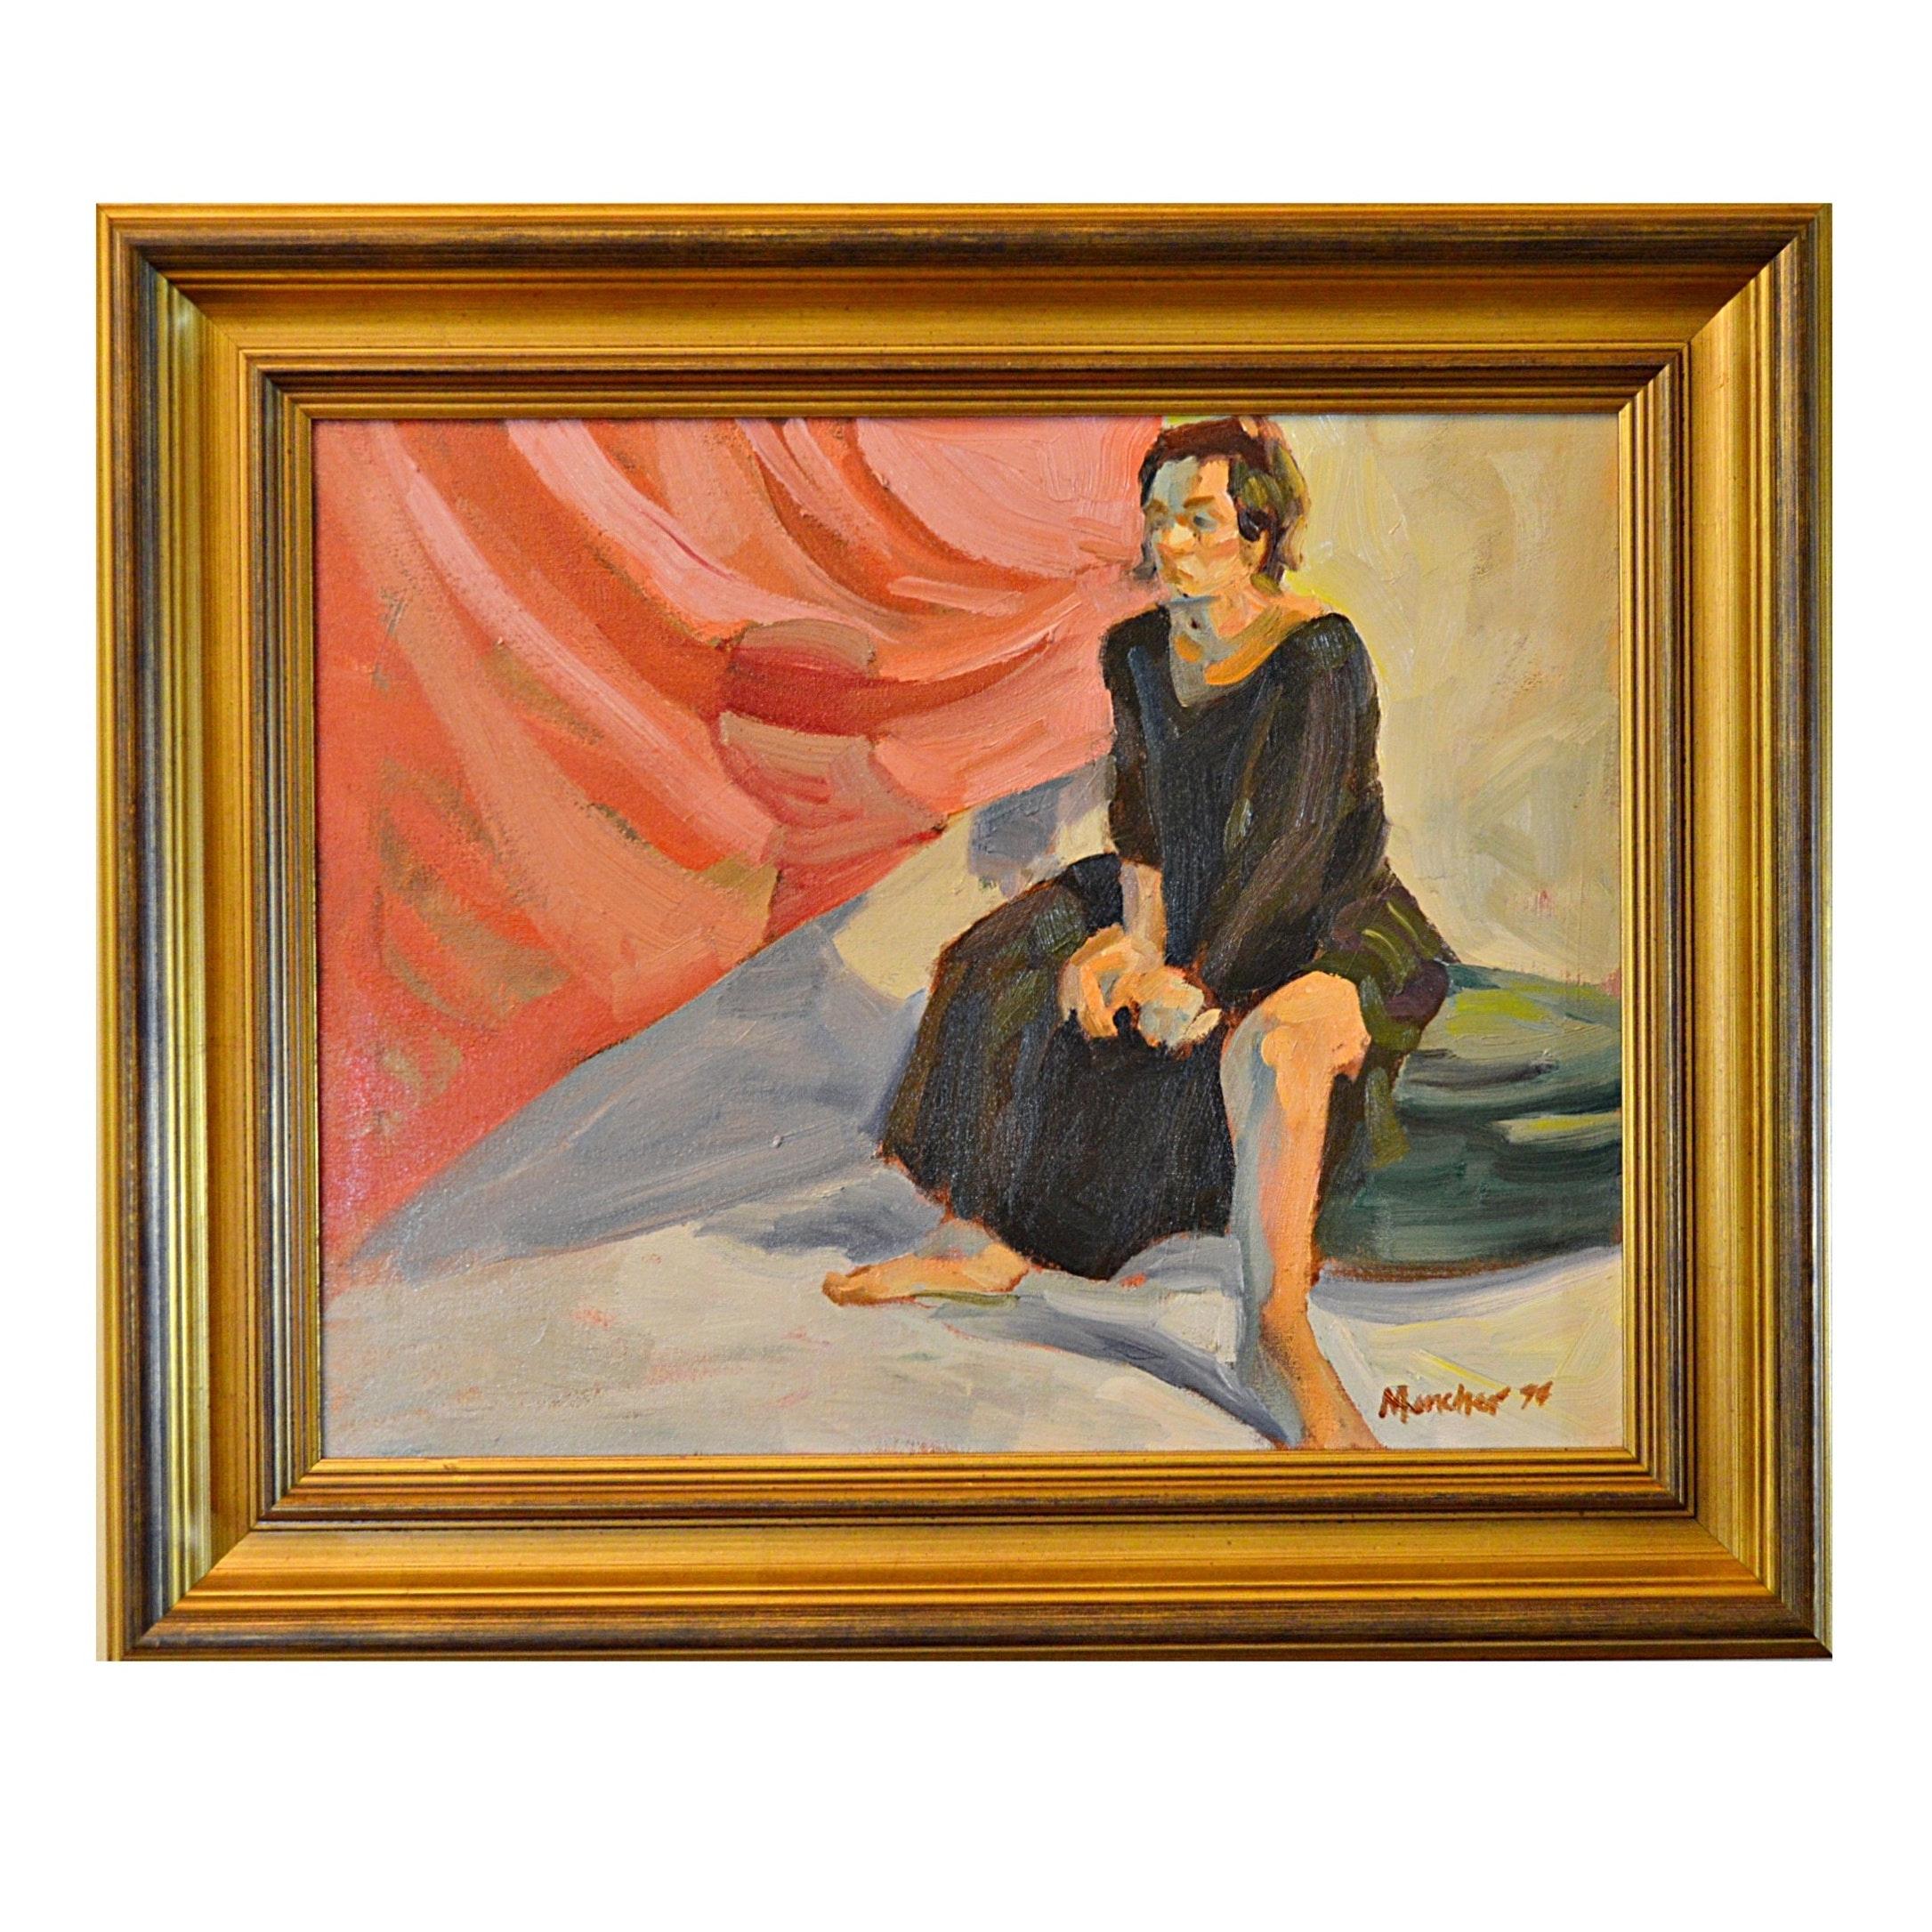 Kenney Mencher Original Oil on Canvas